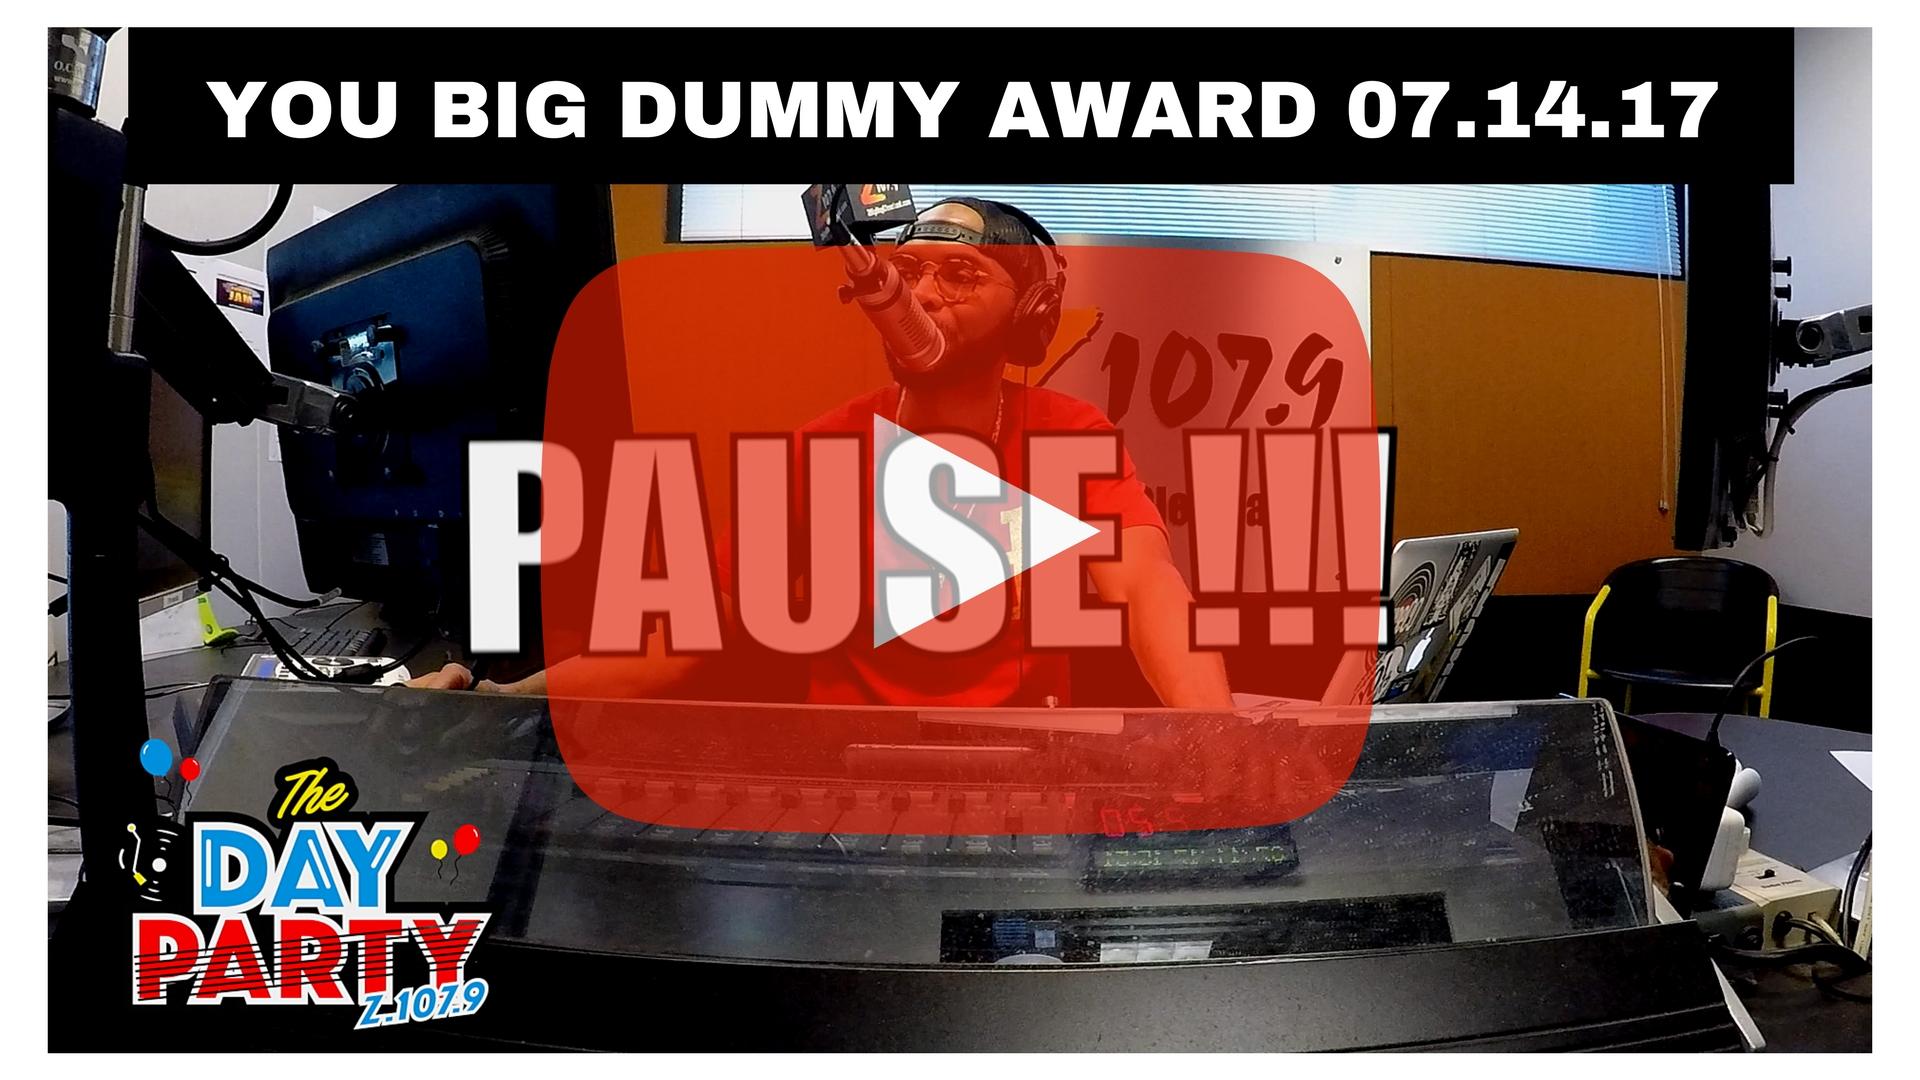 YOU BIG DUMMY AWARD 07.14.17 CUSTOM THUMB